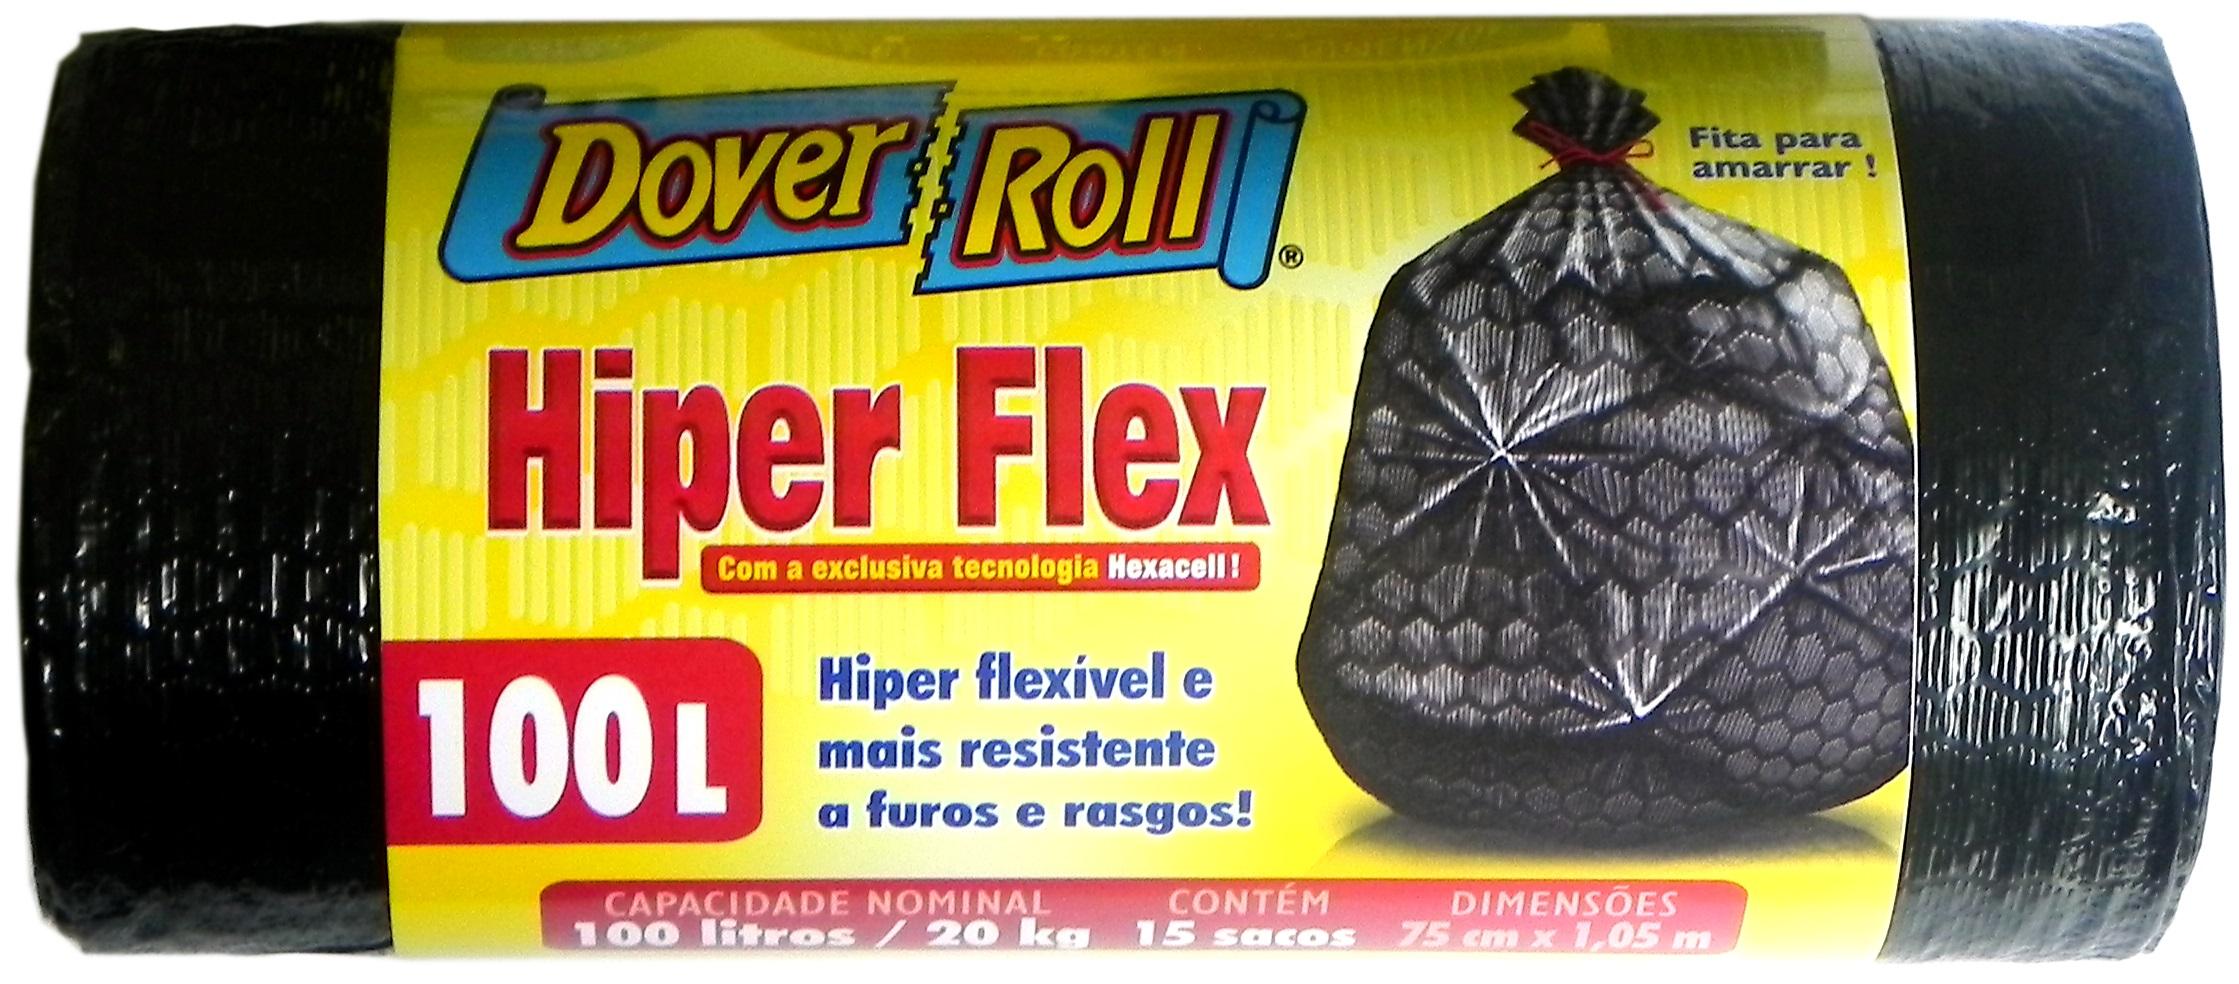 Saco para Lixo Dover-Roll Hiper Flex 100L c/15